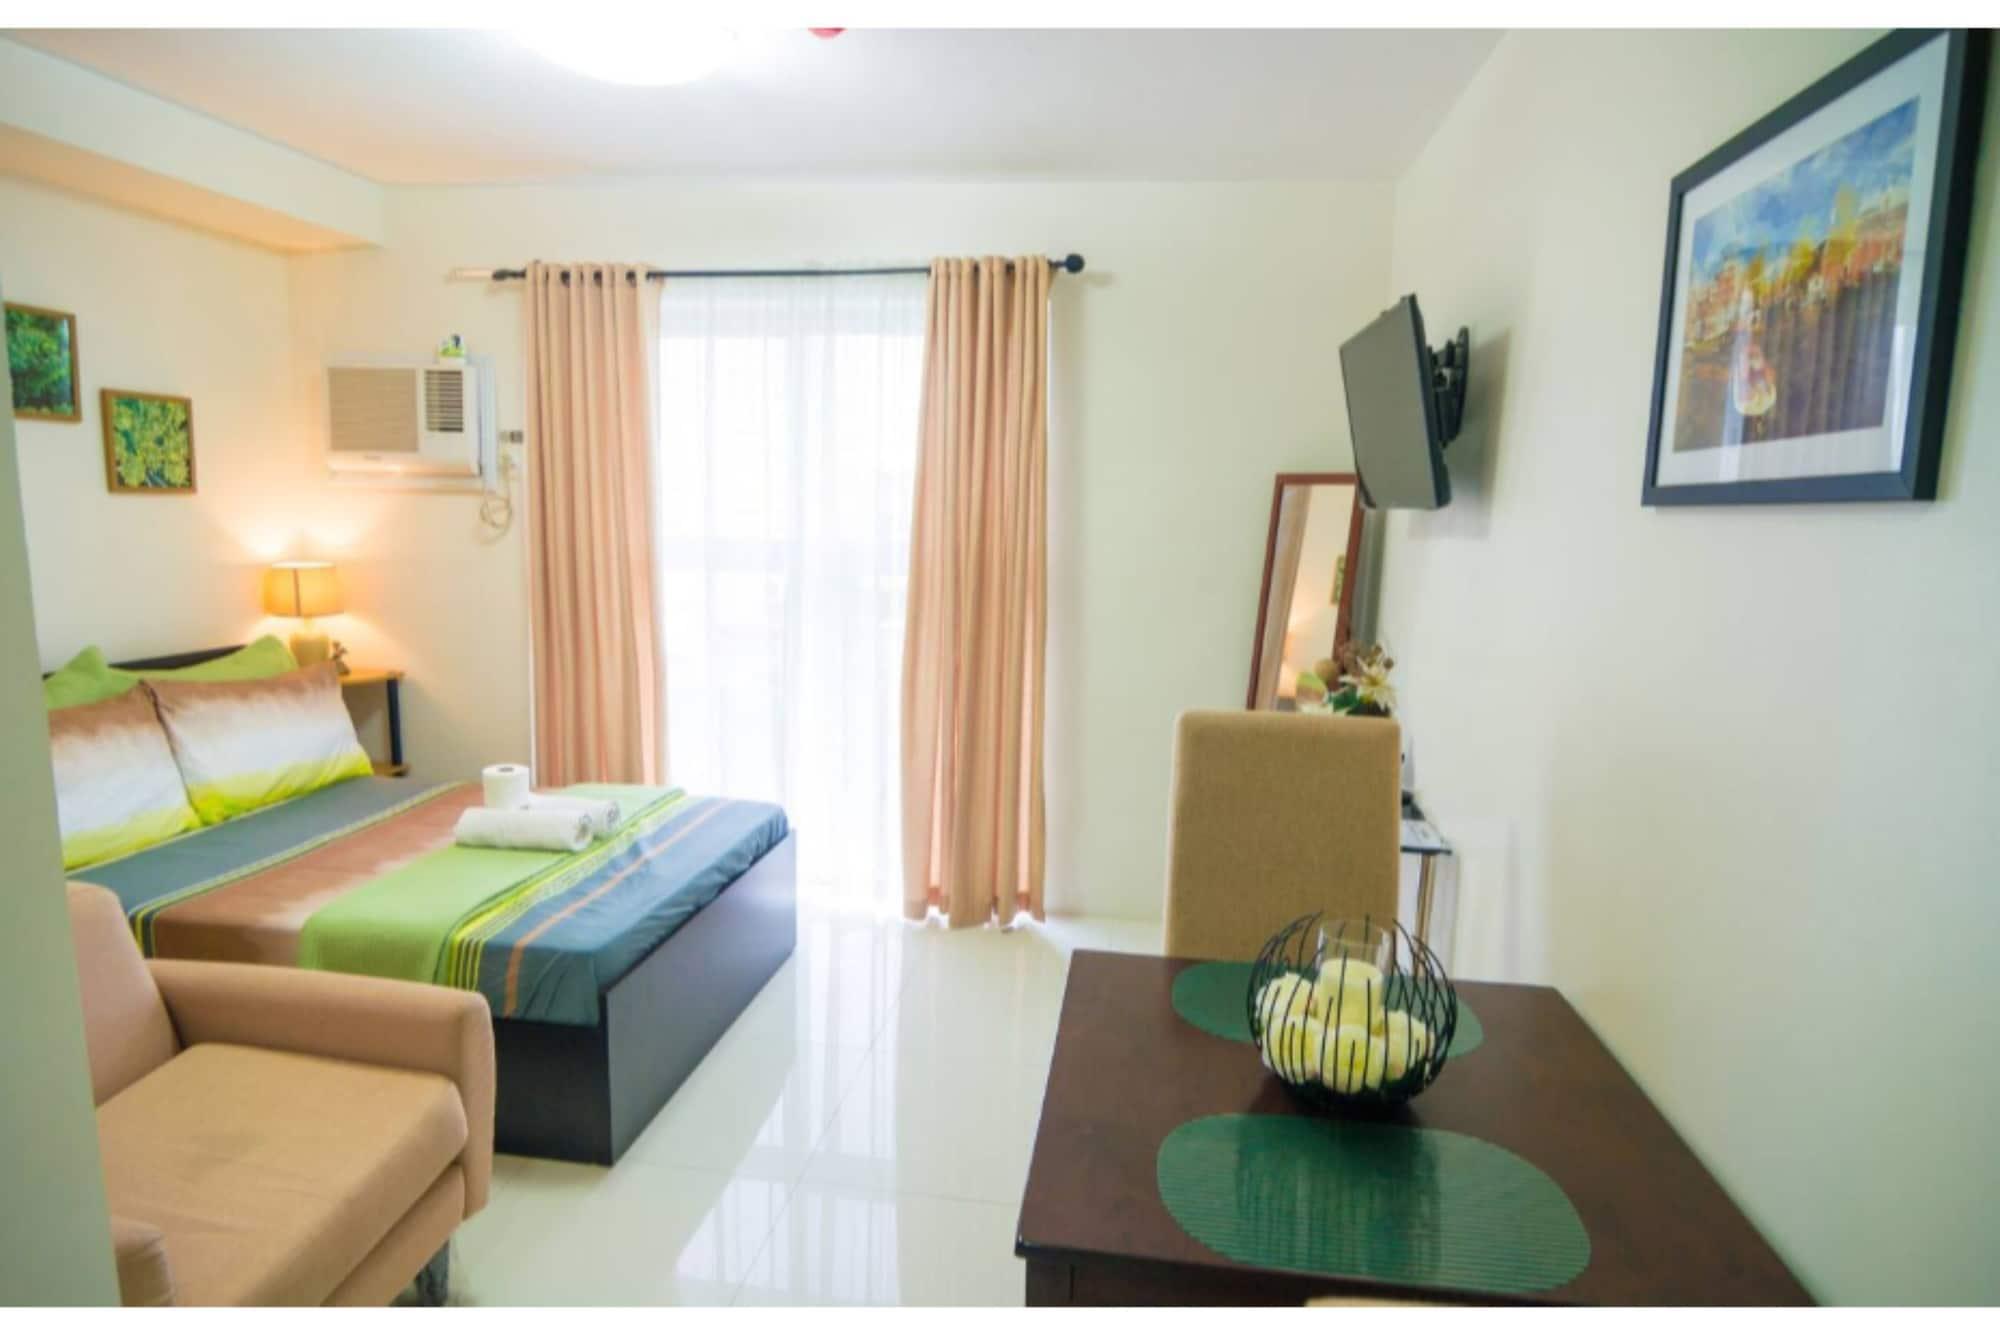 Bamboo Bay Rli, Cebu City